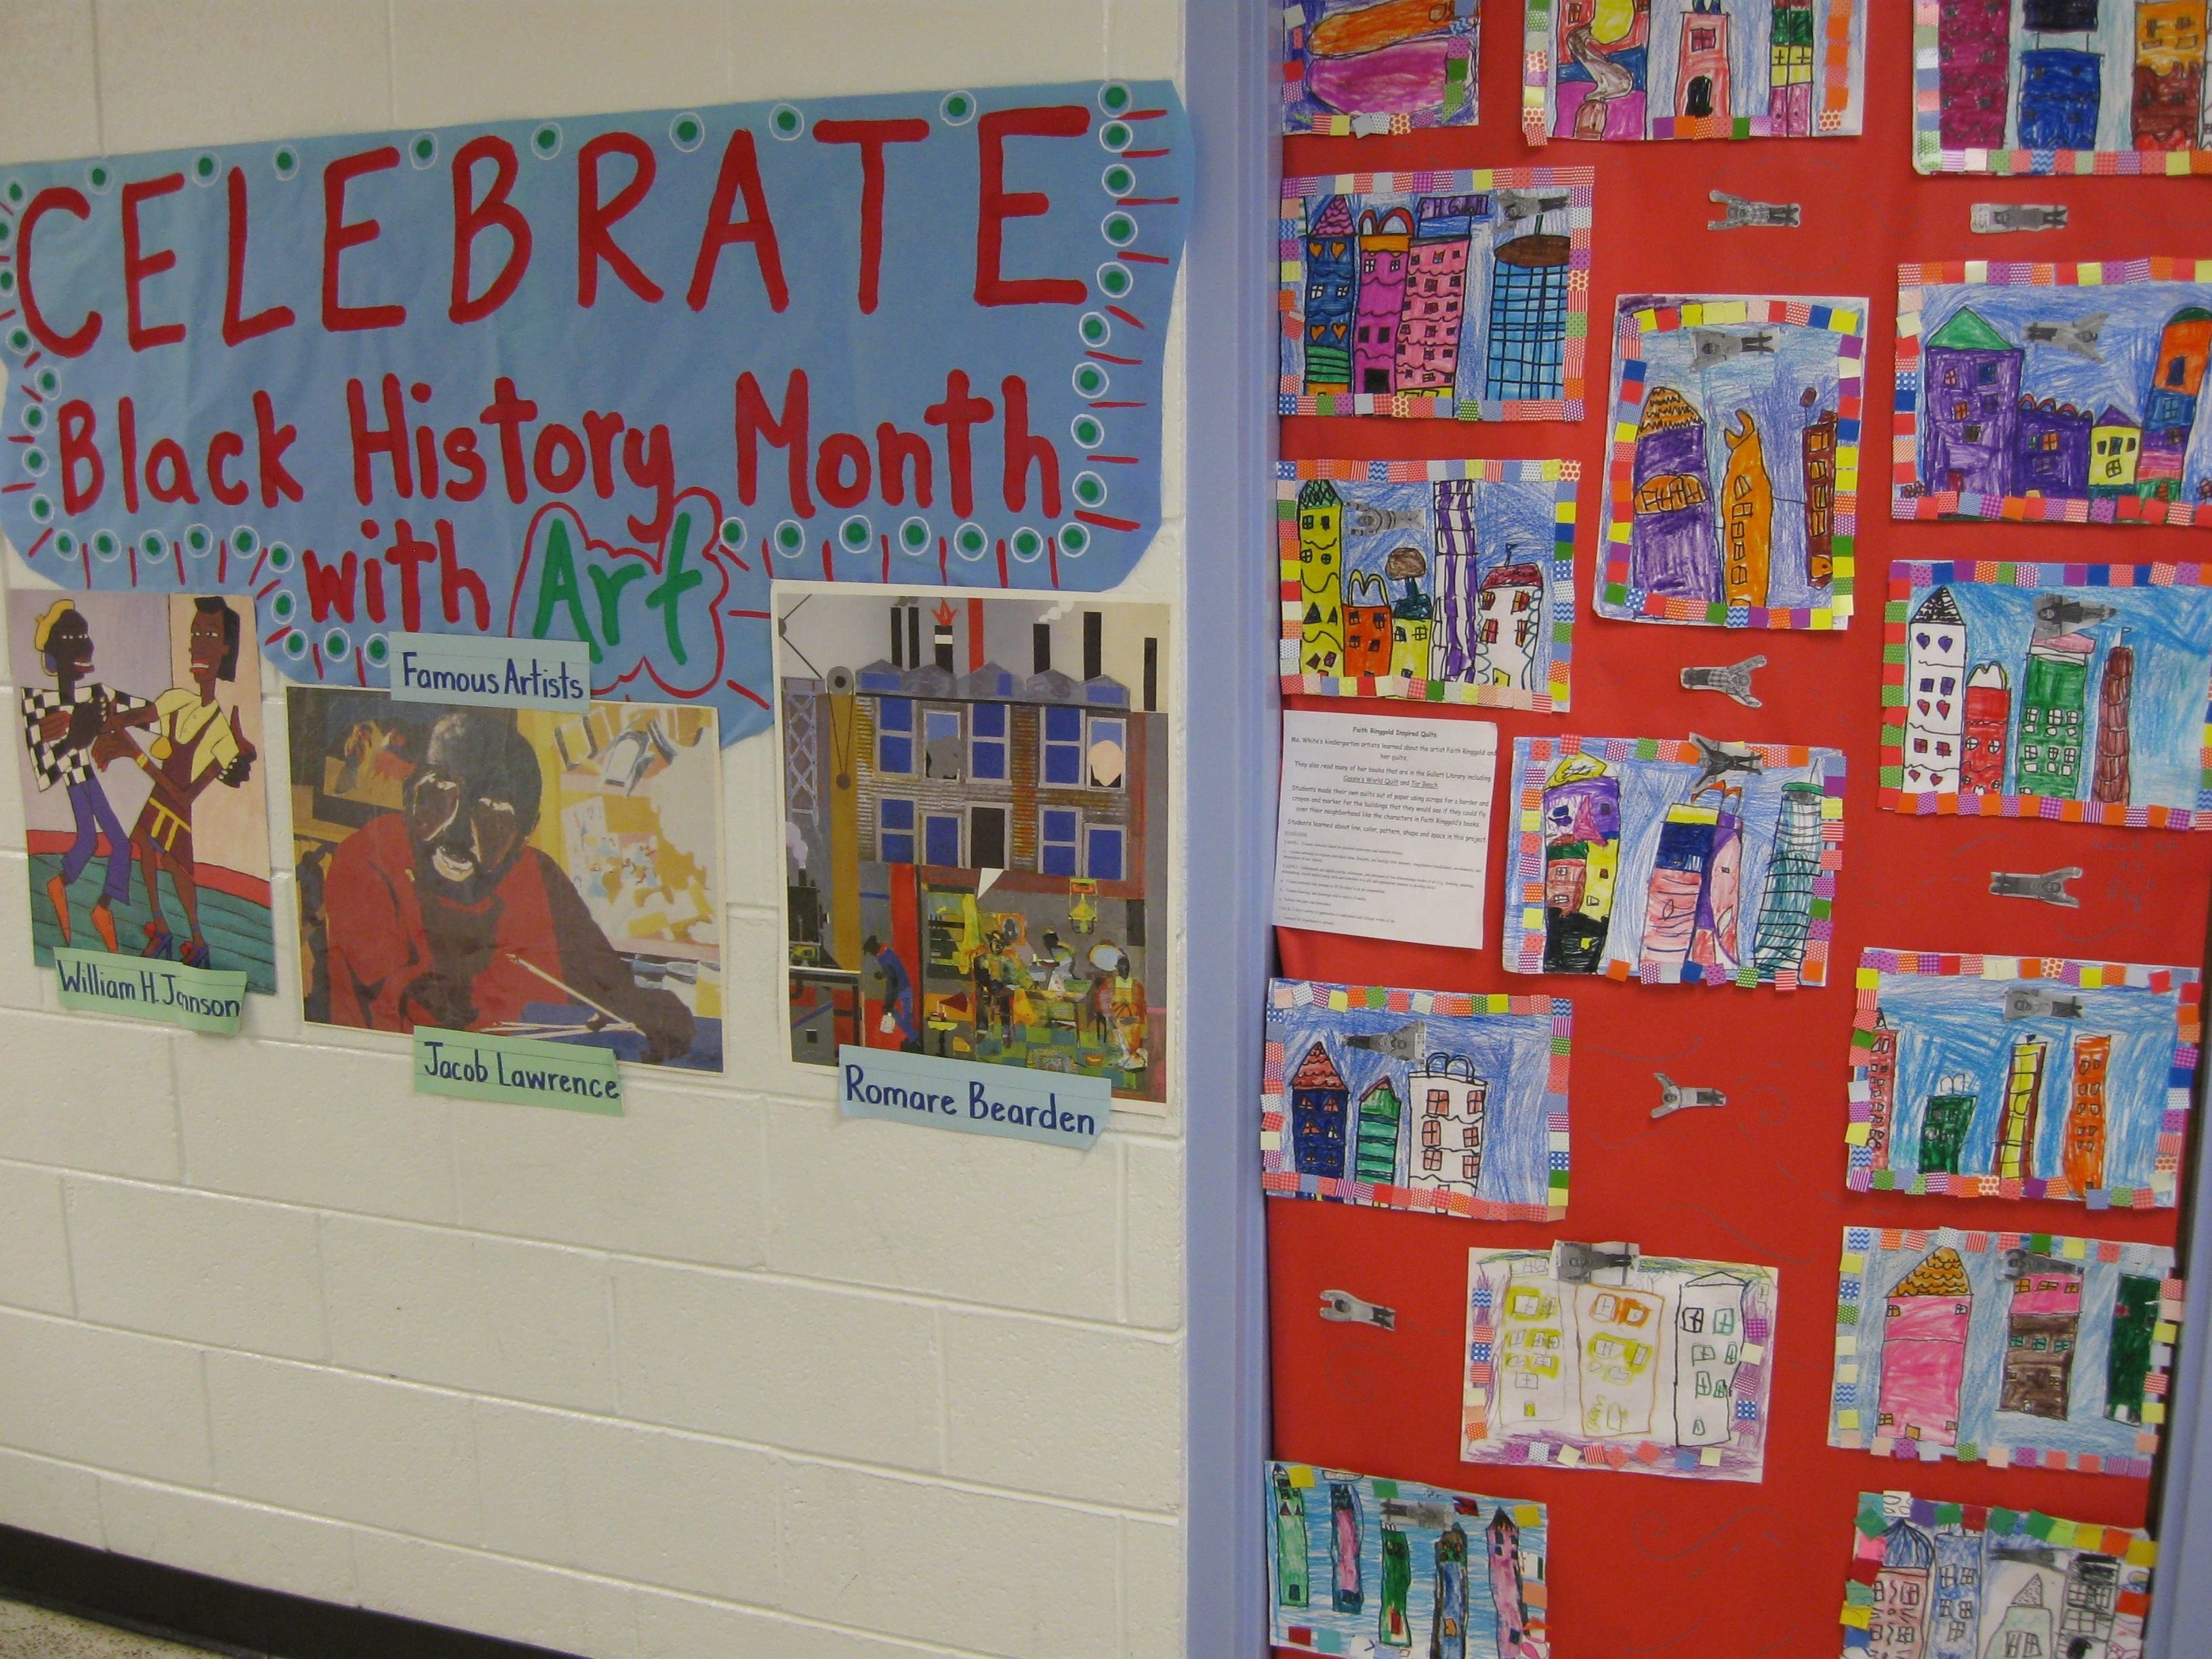 10 Fabulous Black History Month Bulletin Board Ideas black history month with art school ideas pinterest black 2021